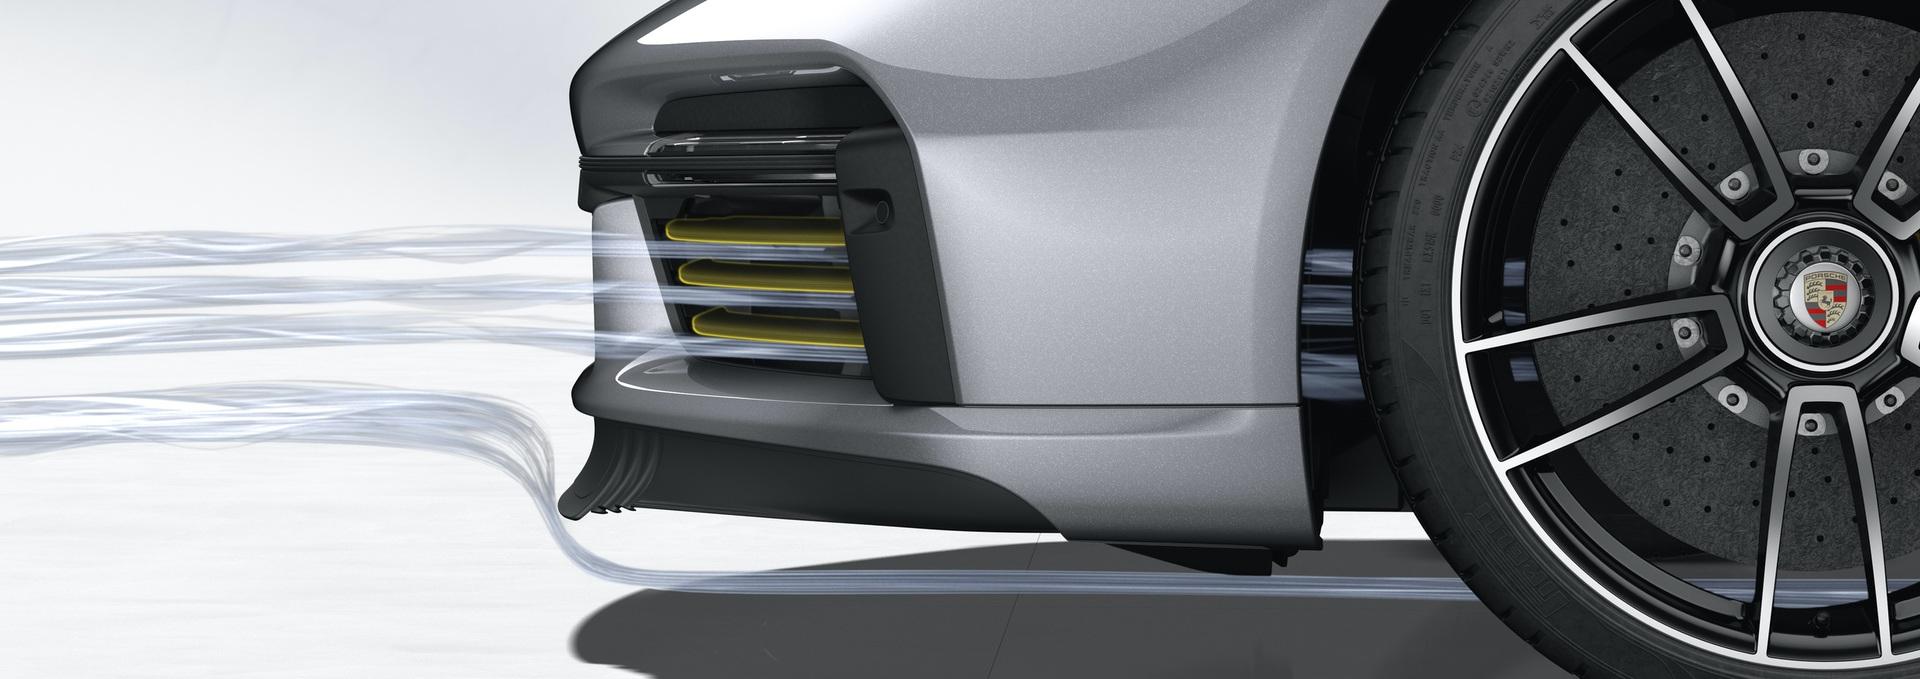 2020_Porsche_911-Turbo_S-aerodynamics_0004